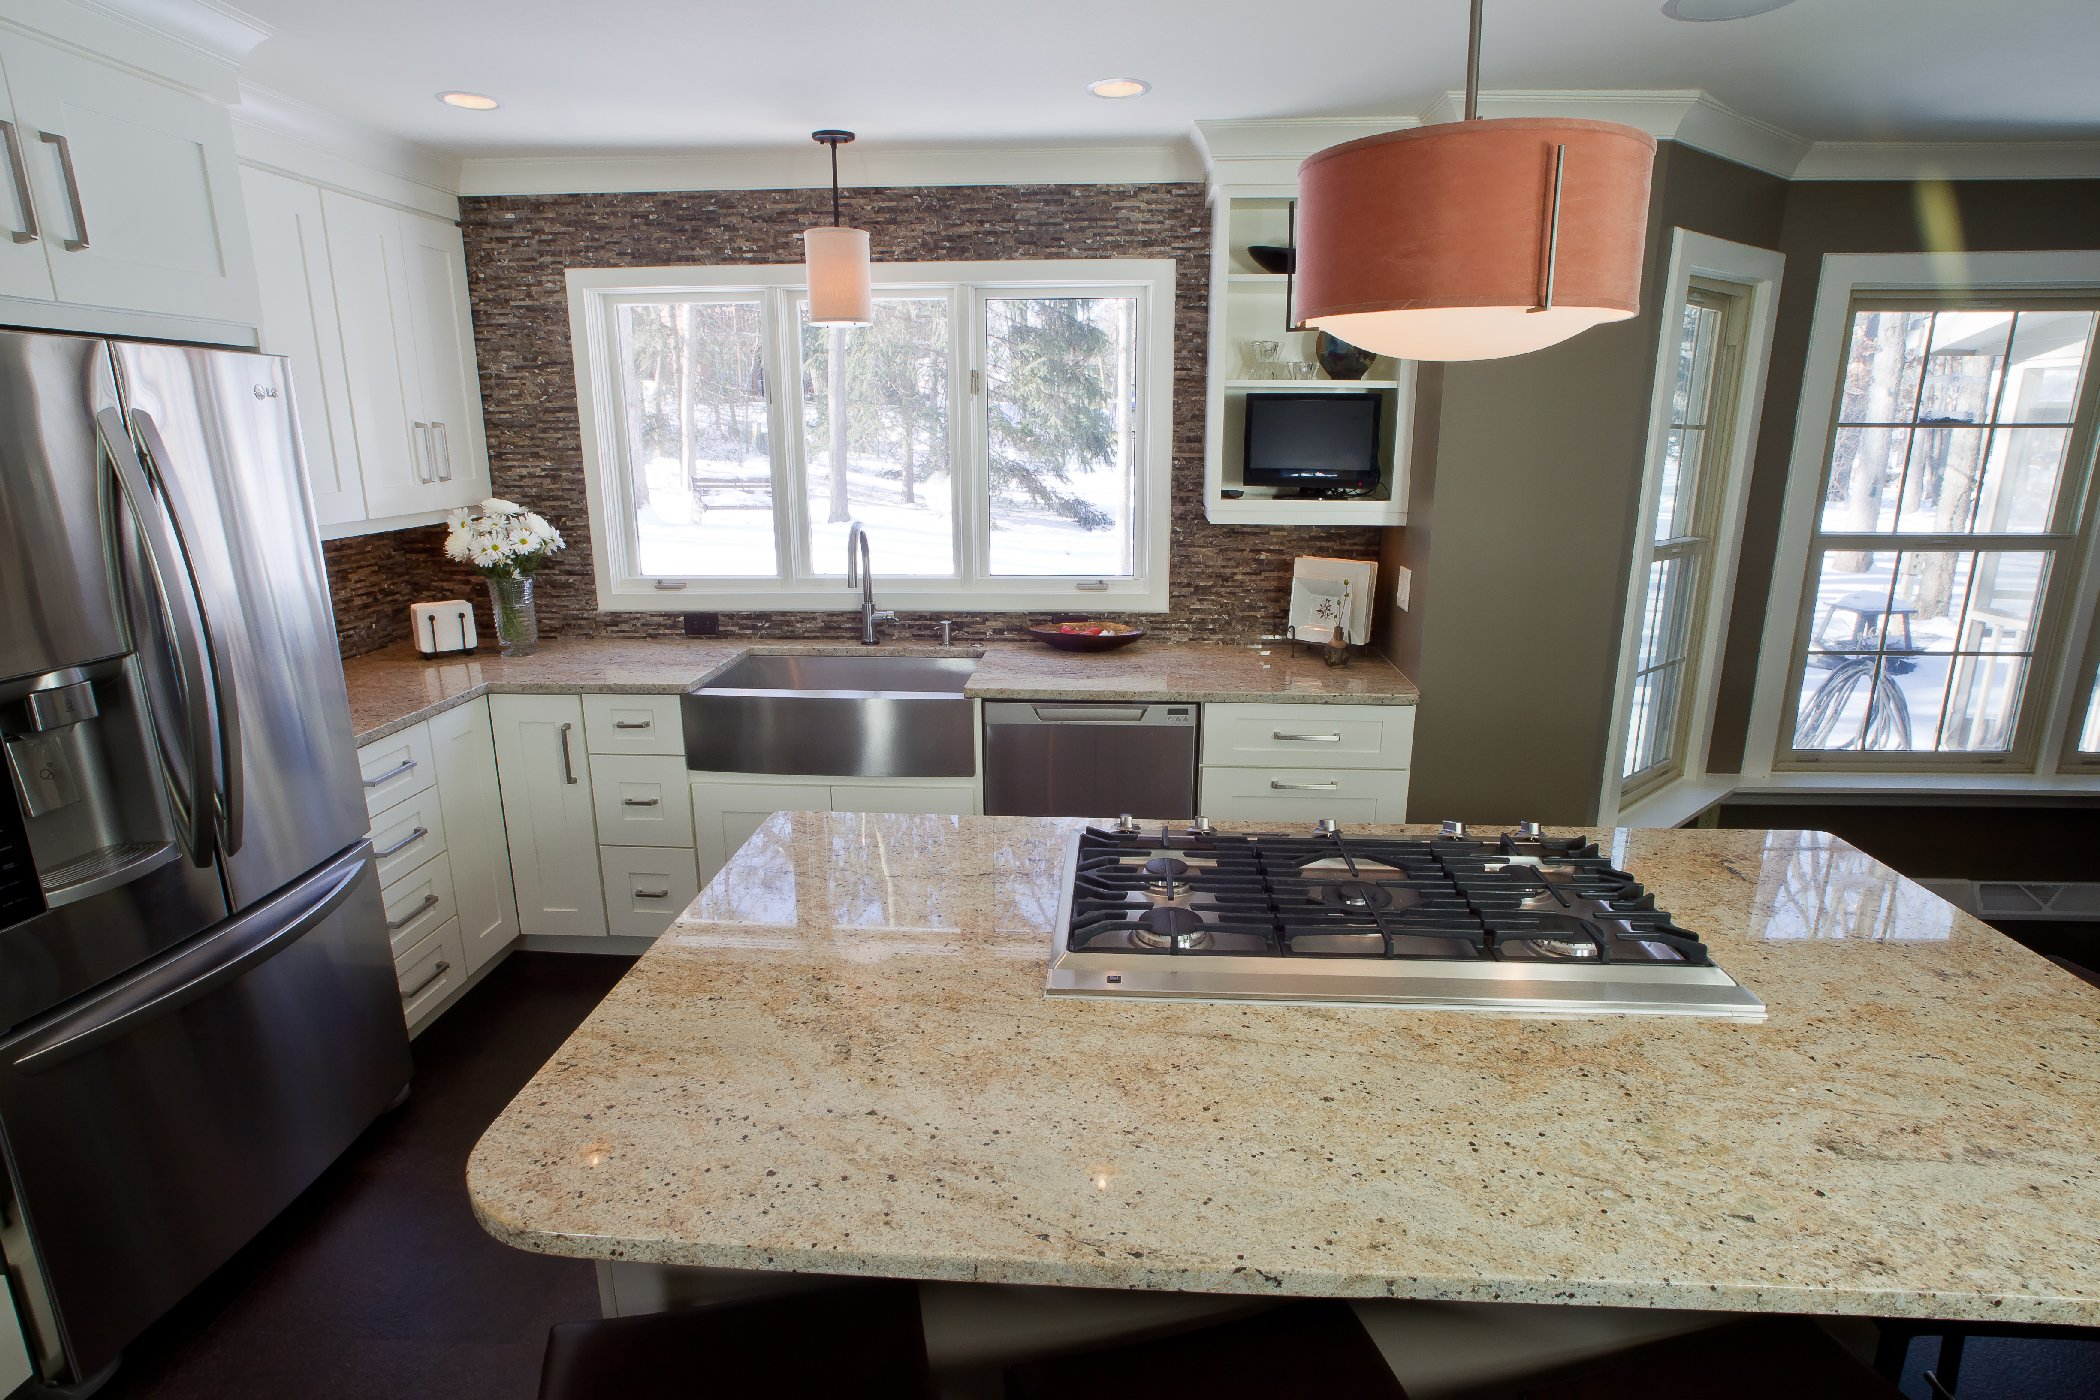 Kitchen Remodeling and Design, cooktop in the island, large sink window, dark brown backsplash, tv kitchen shelf,